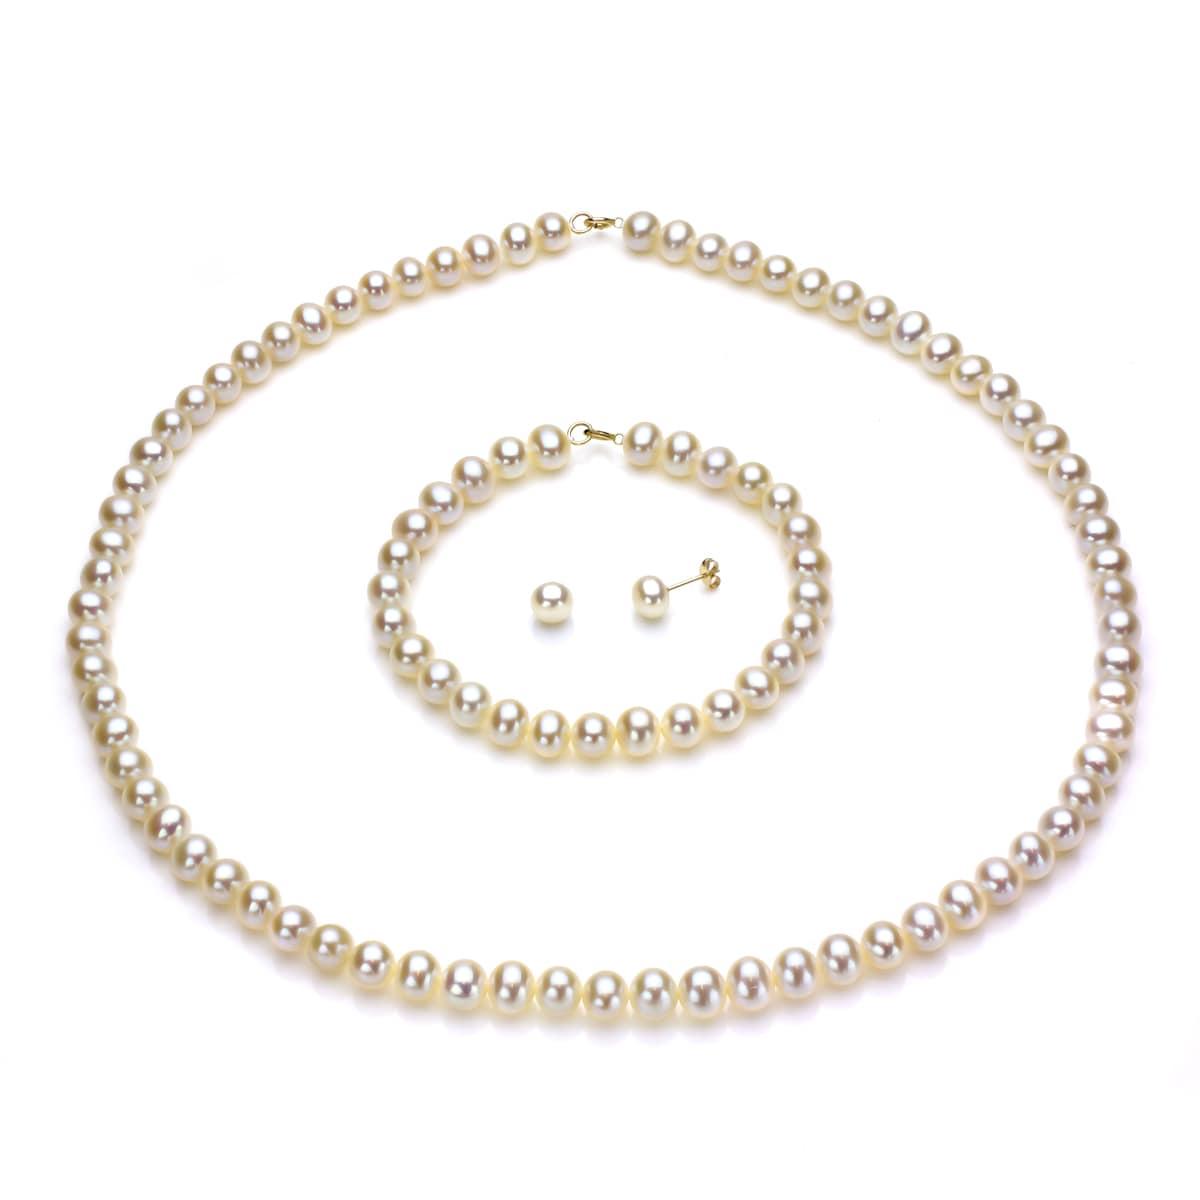 c9255b626e2 Buy Pearl Bracelets Online at Overstock | Our Best Bracelets Deals